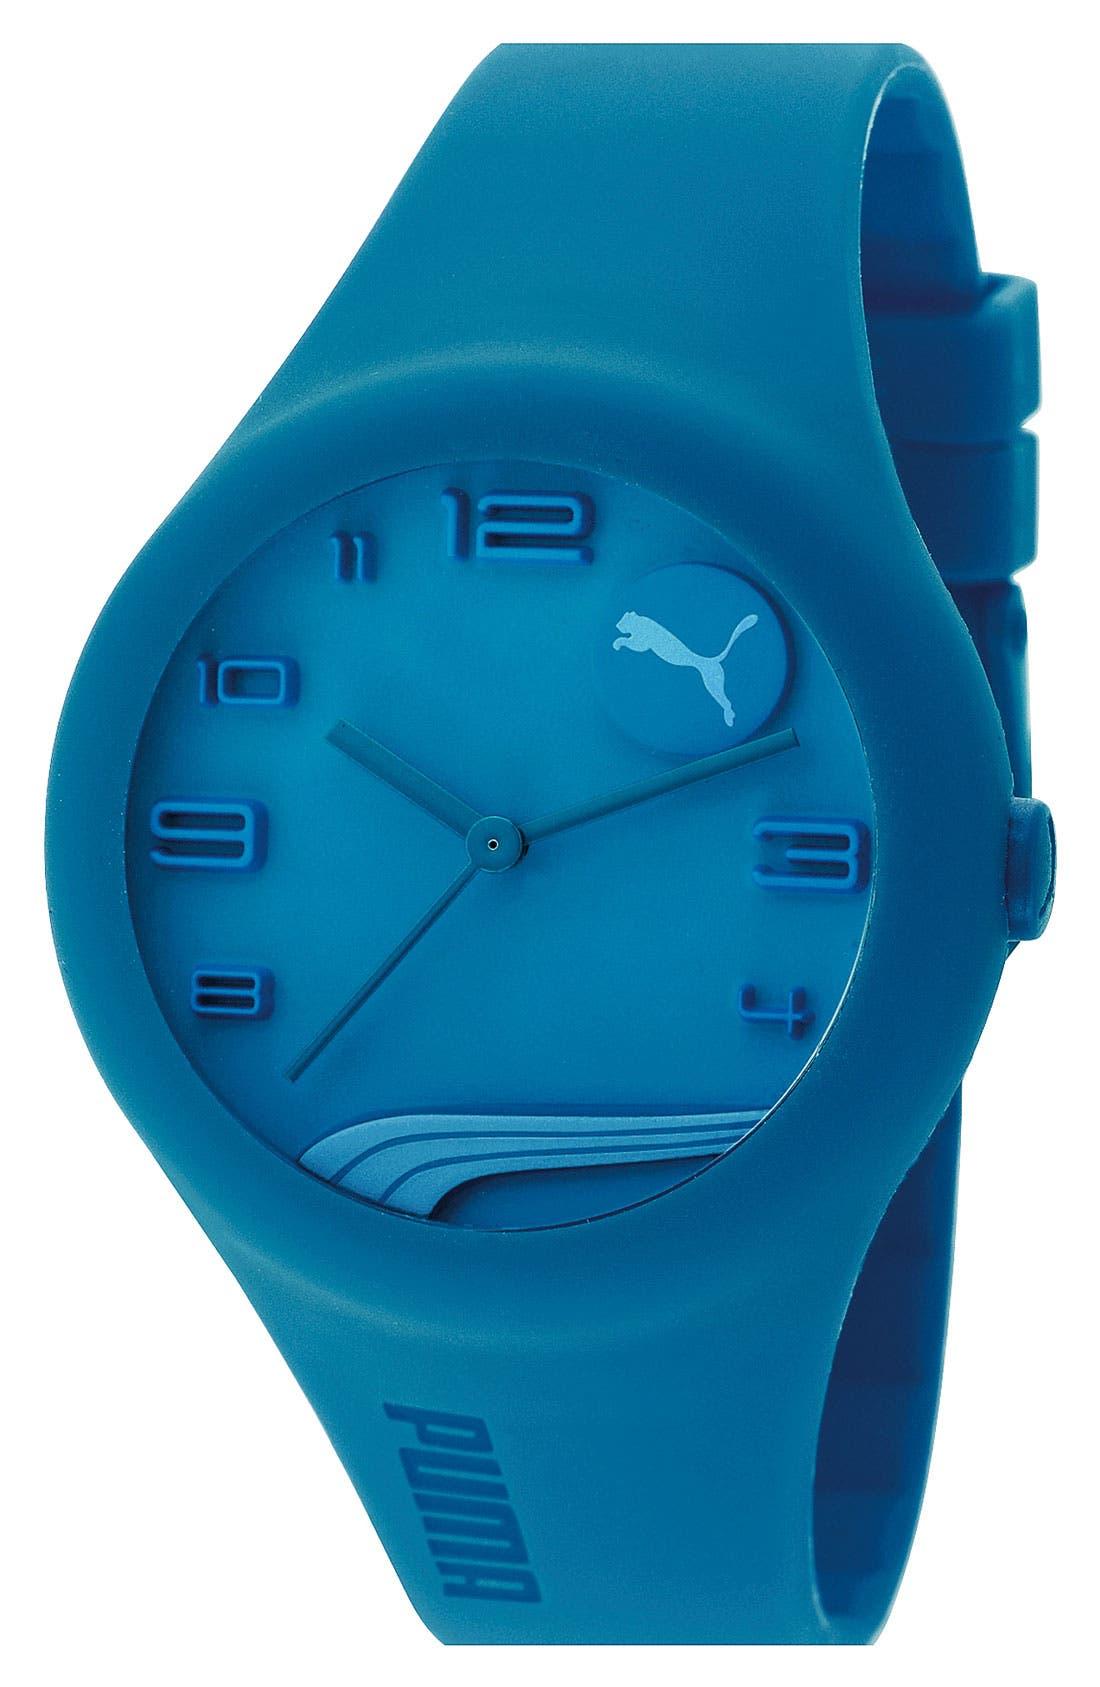 Main Image - PUMA 'Form' Silicone Watch, 44mm